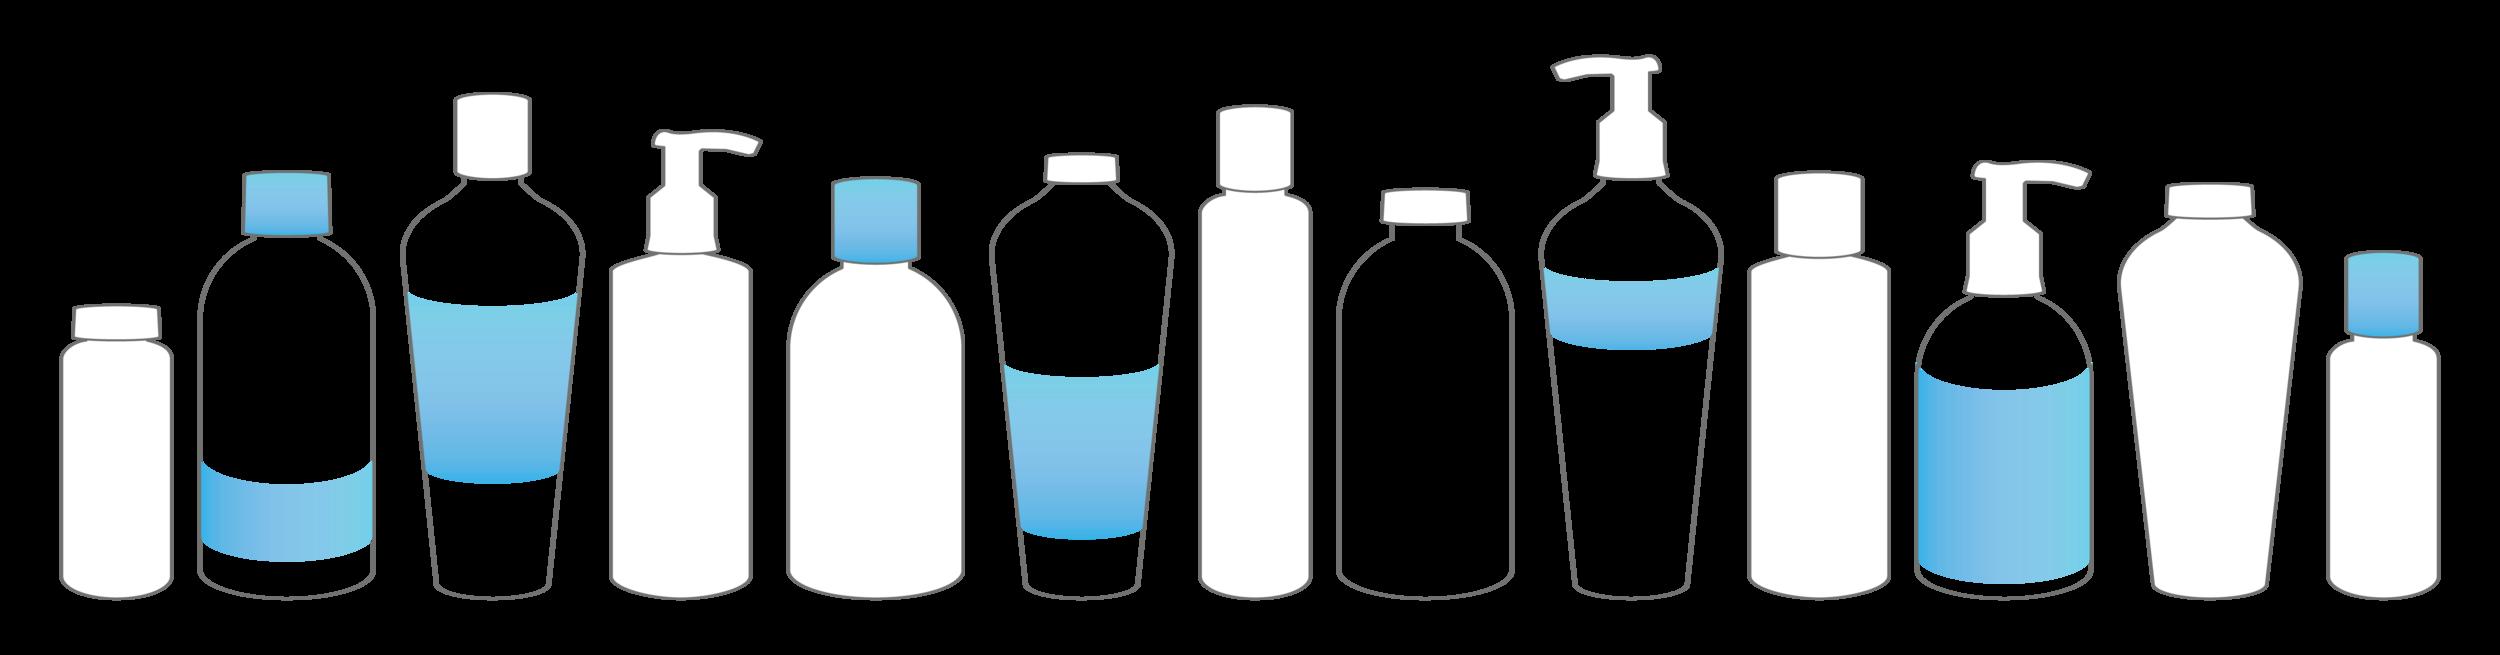 PakLab_Illustration_of_Bottles